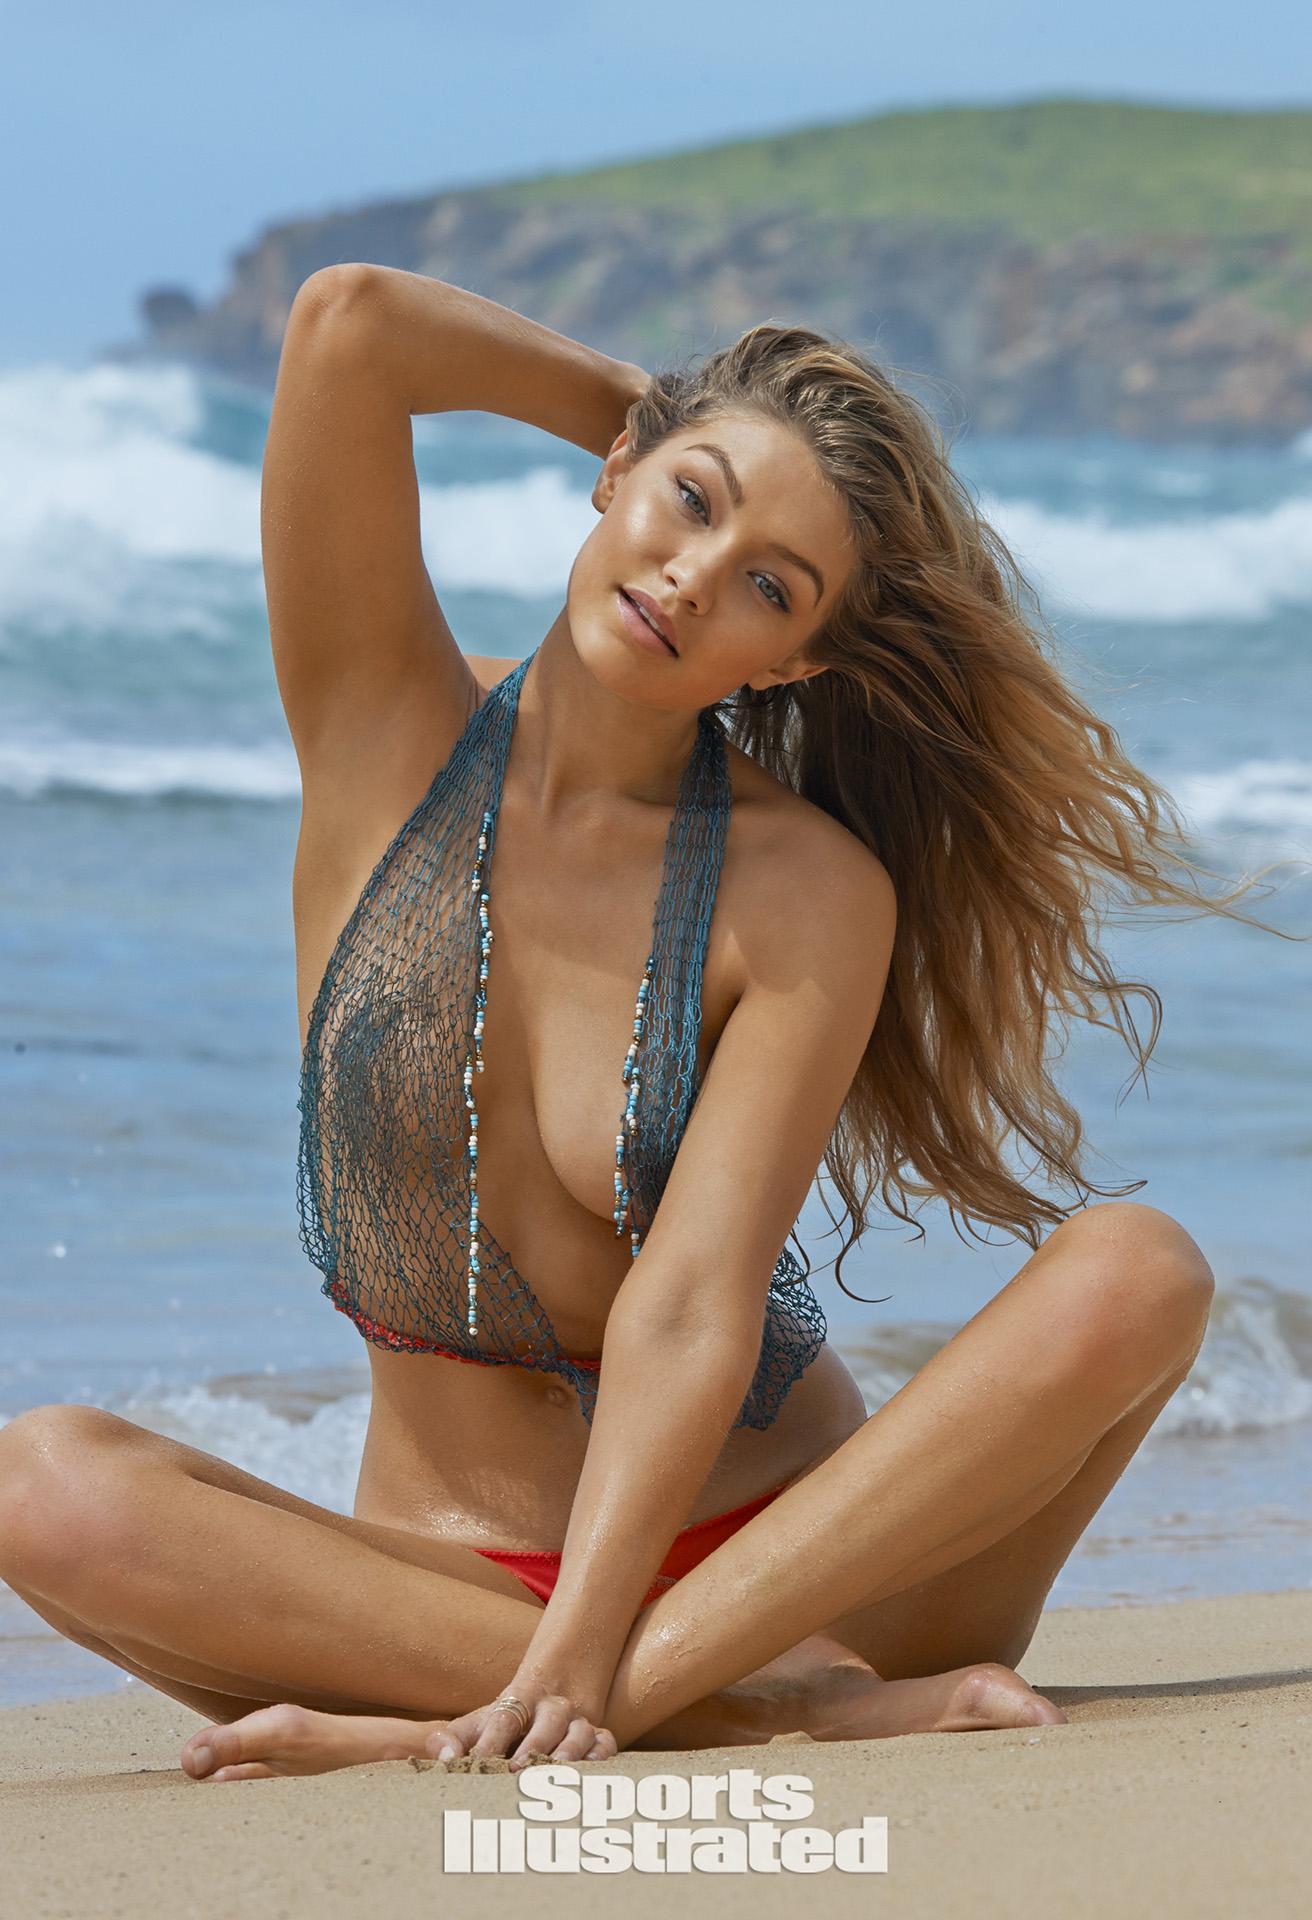 Gigi hadid sports illustrated swimsuit